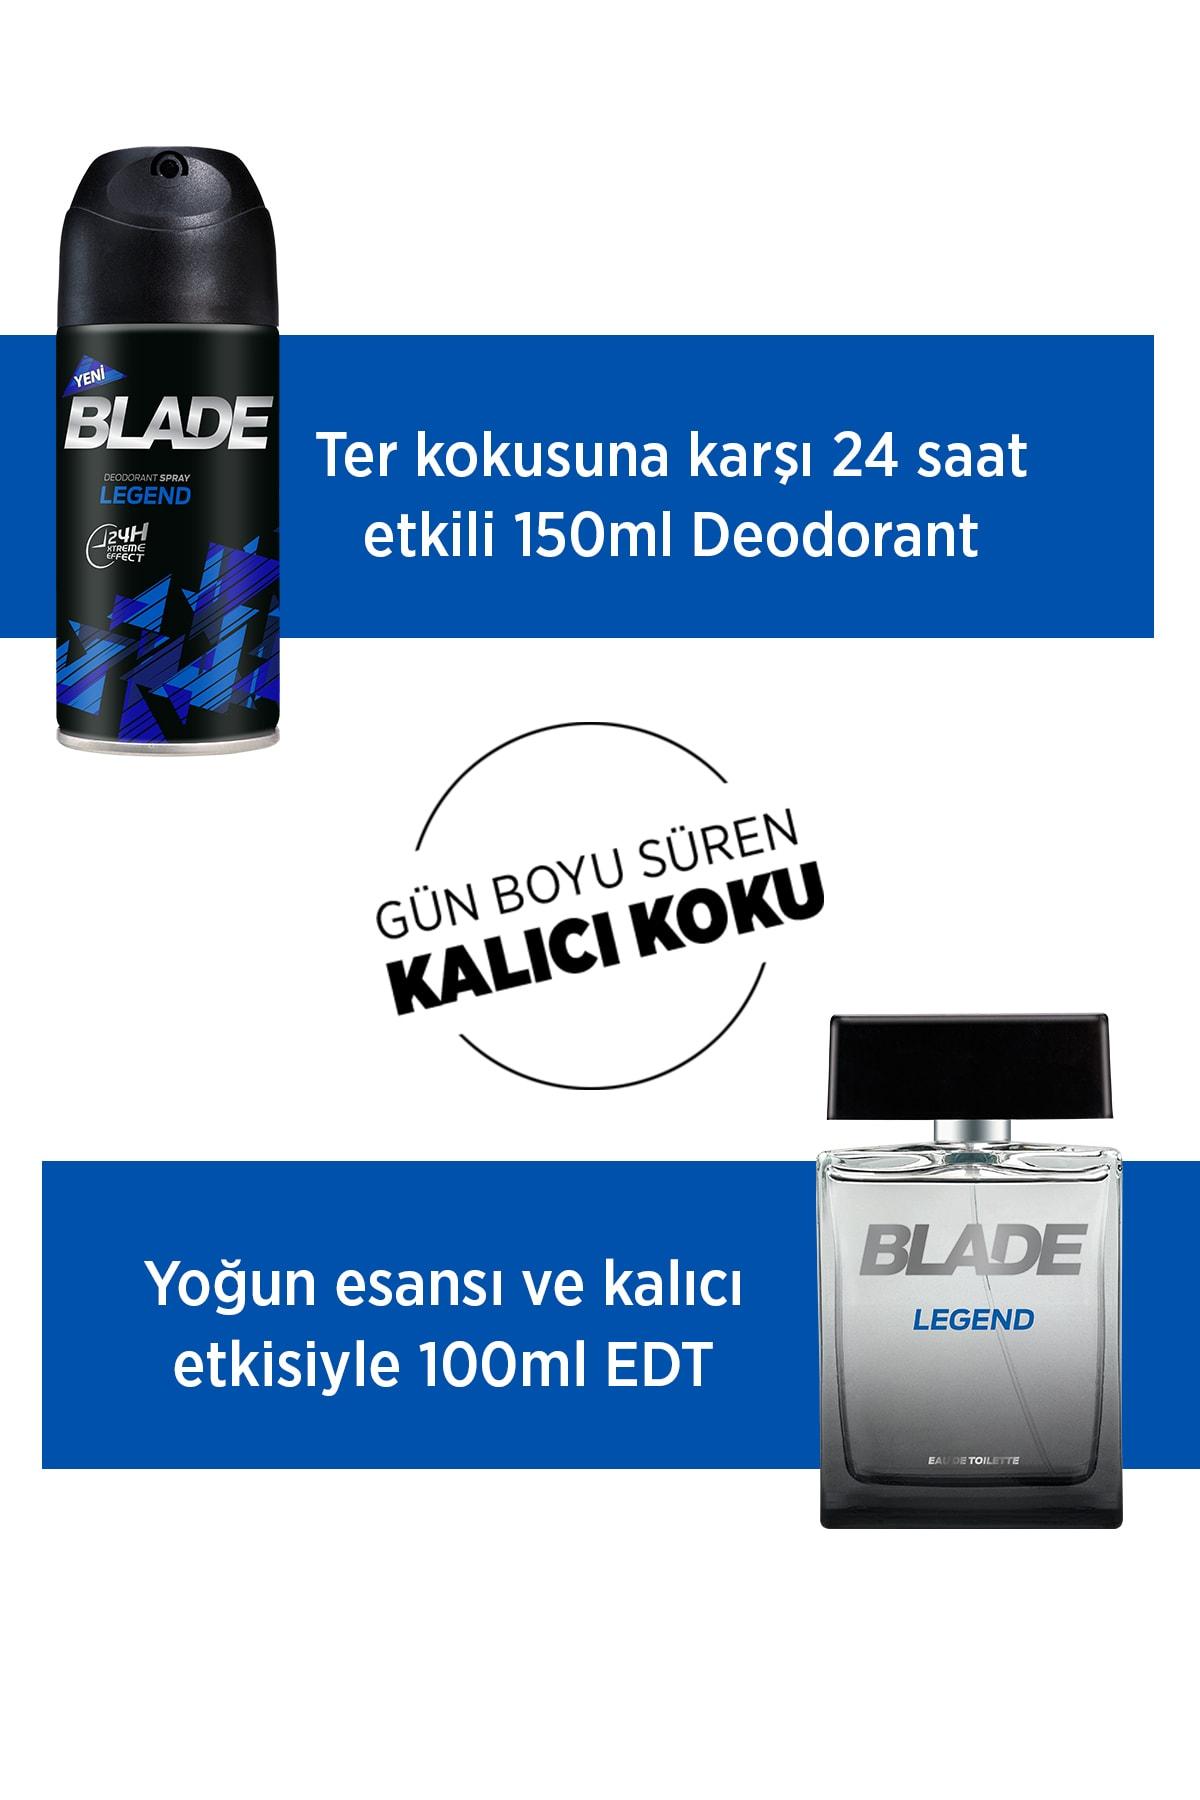 Blade Legend Erkek Deodorant 3x150ml 2